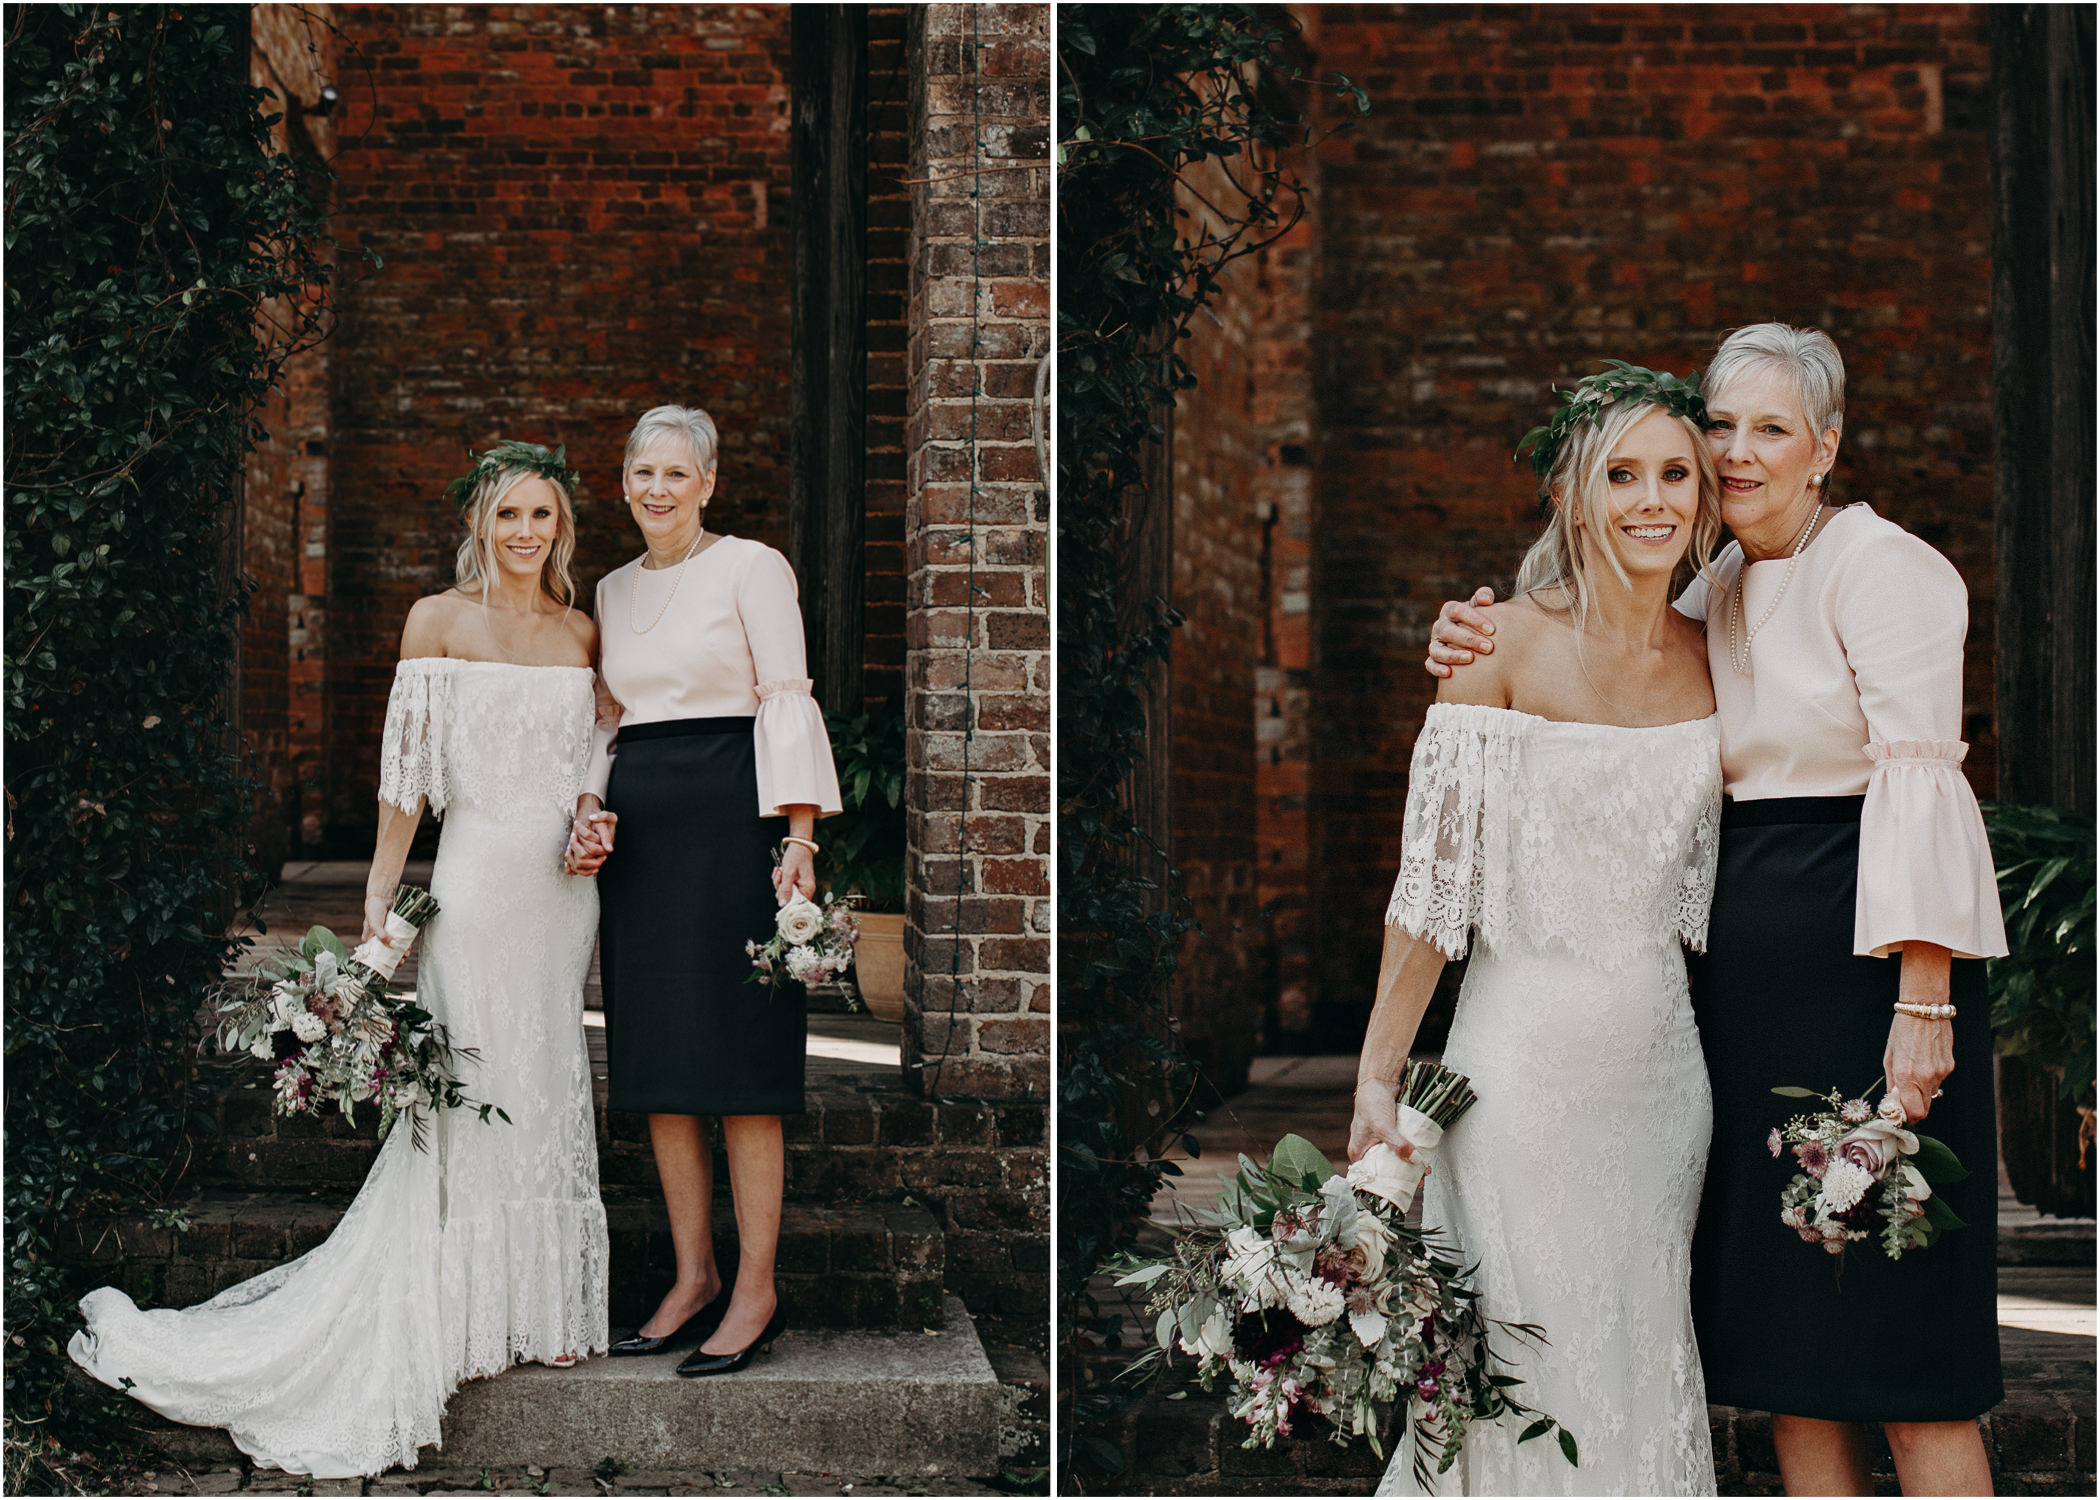 59 - Barnsley Gardens Wedding - Family Portraits - Wedding Party portraits - First Look .jpg